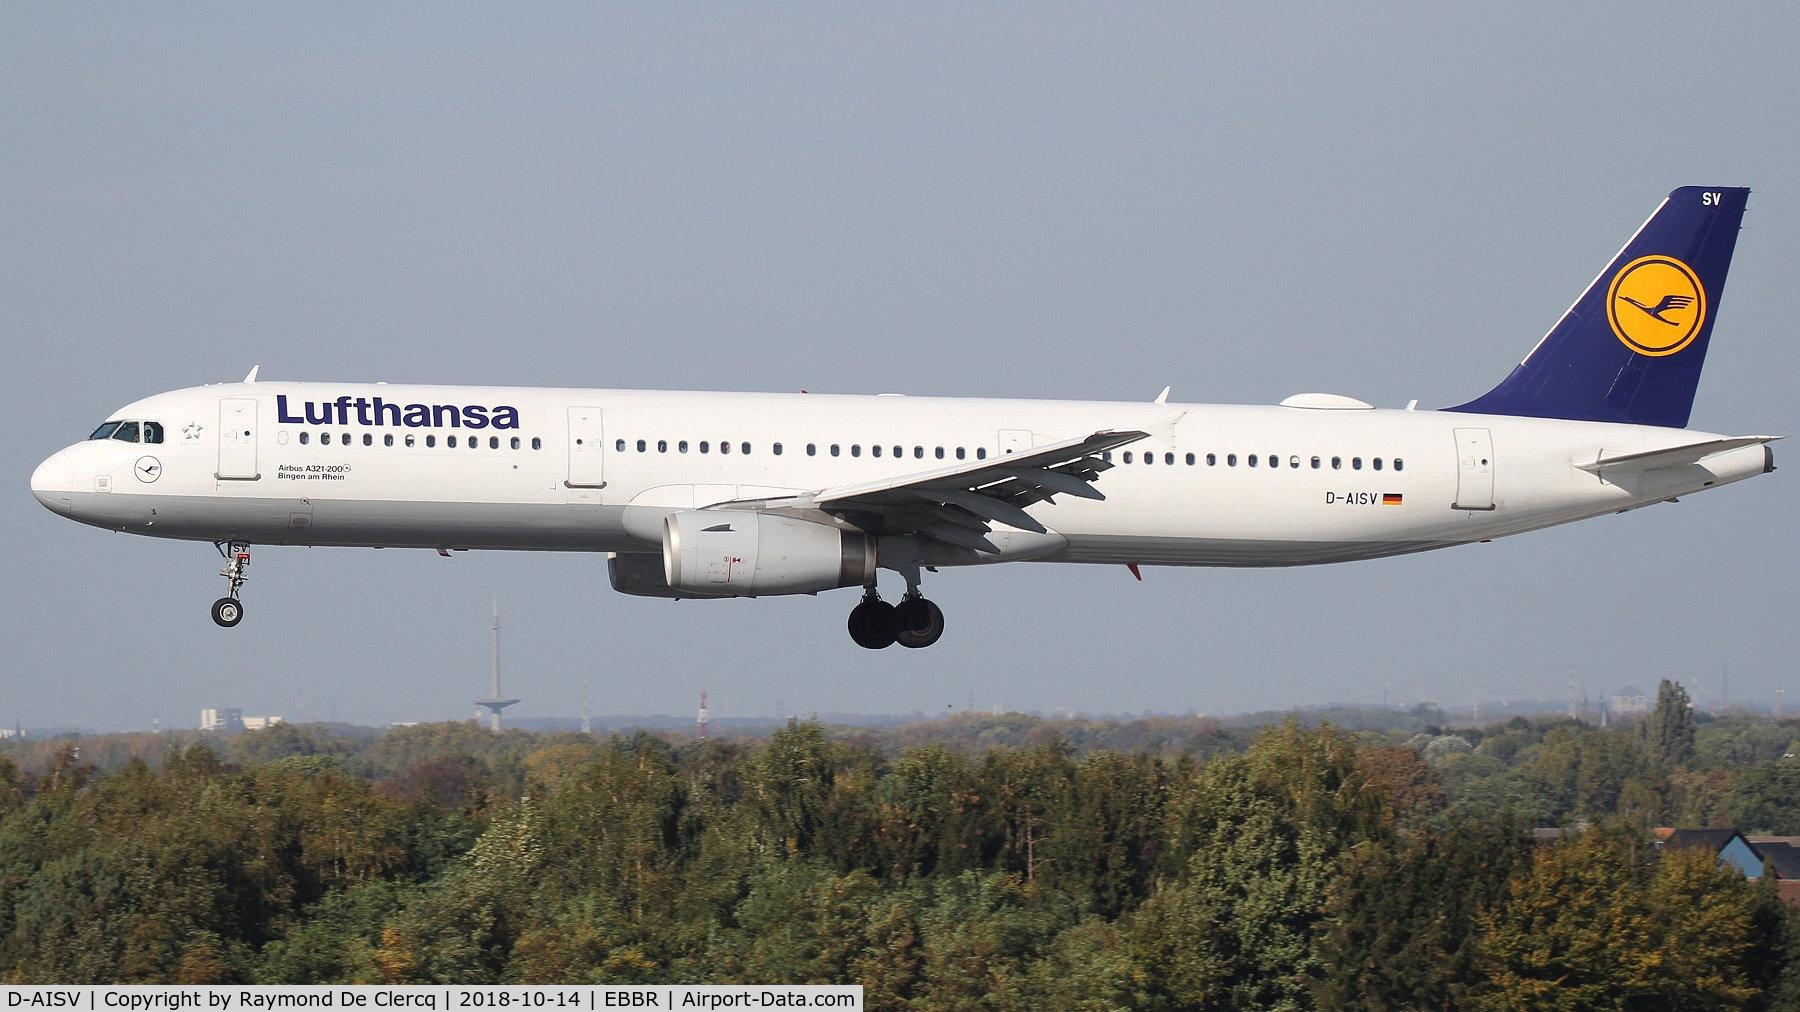 D-AISV, 2009 Airbus A321-231 C/N 4050, Landing at Brussels.